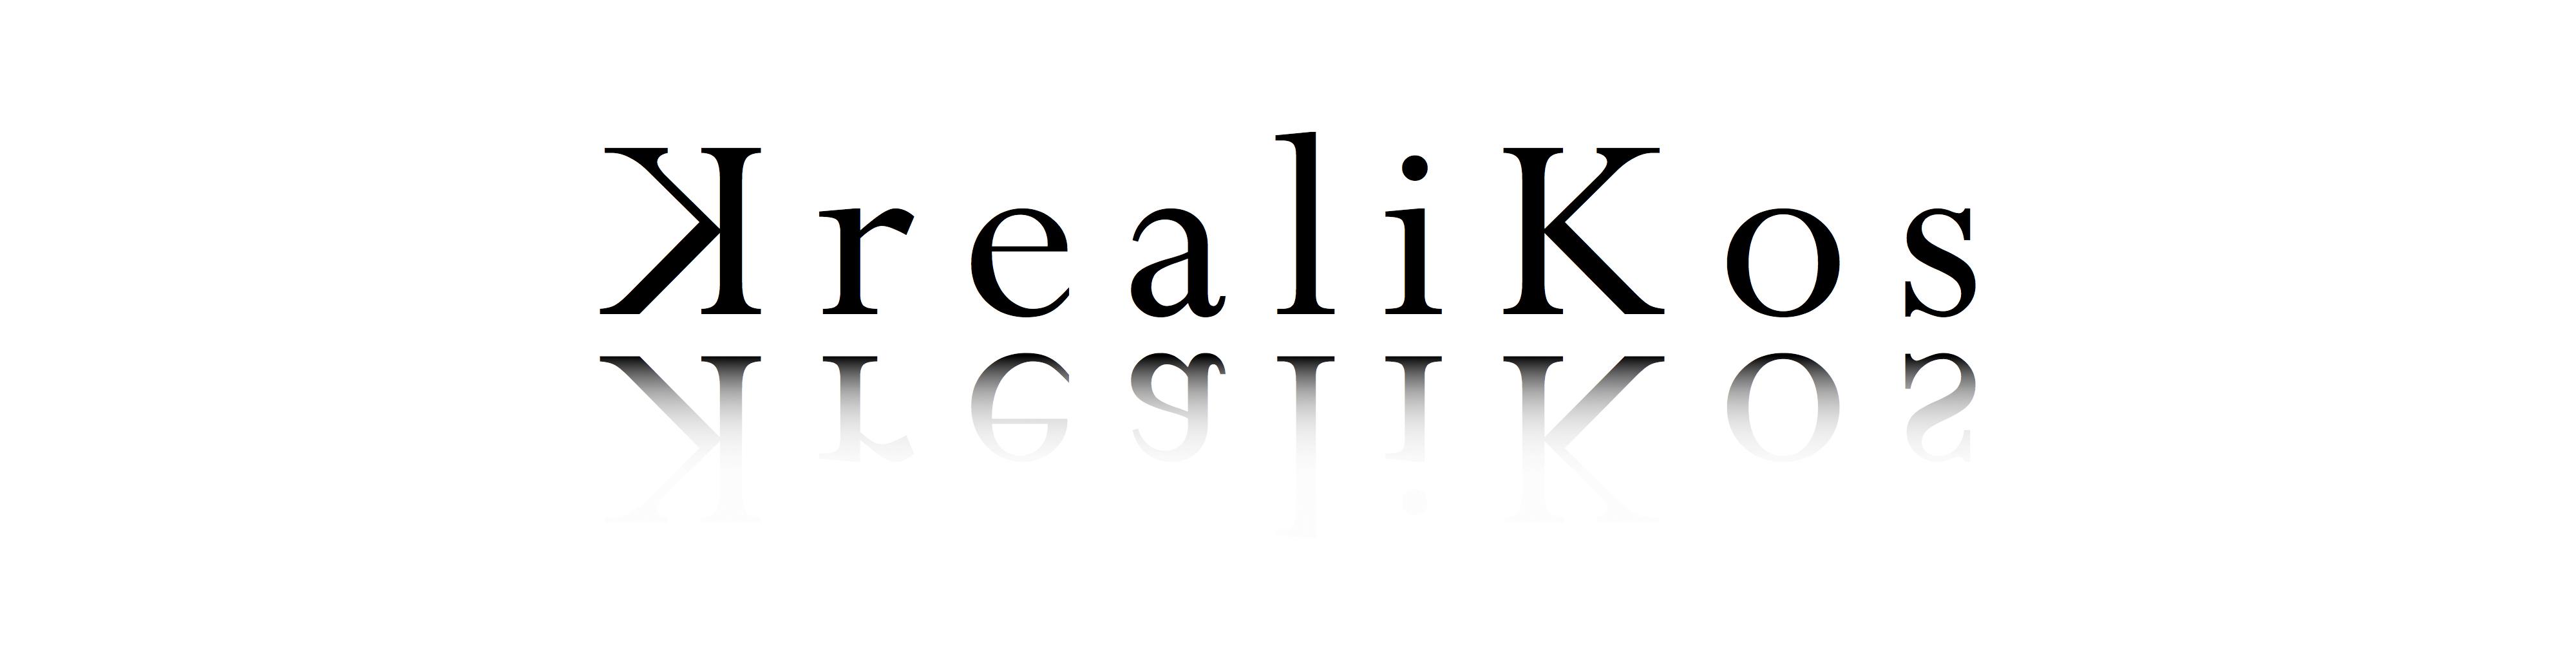 Cosmétiques - Krealikos